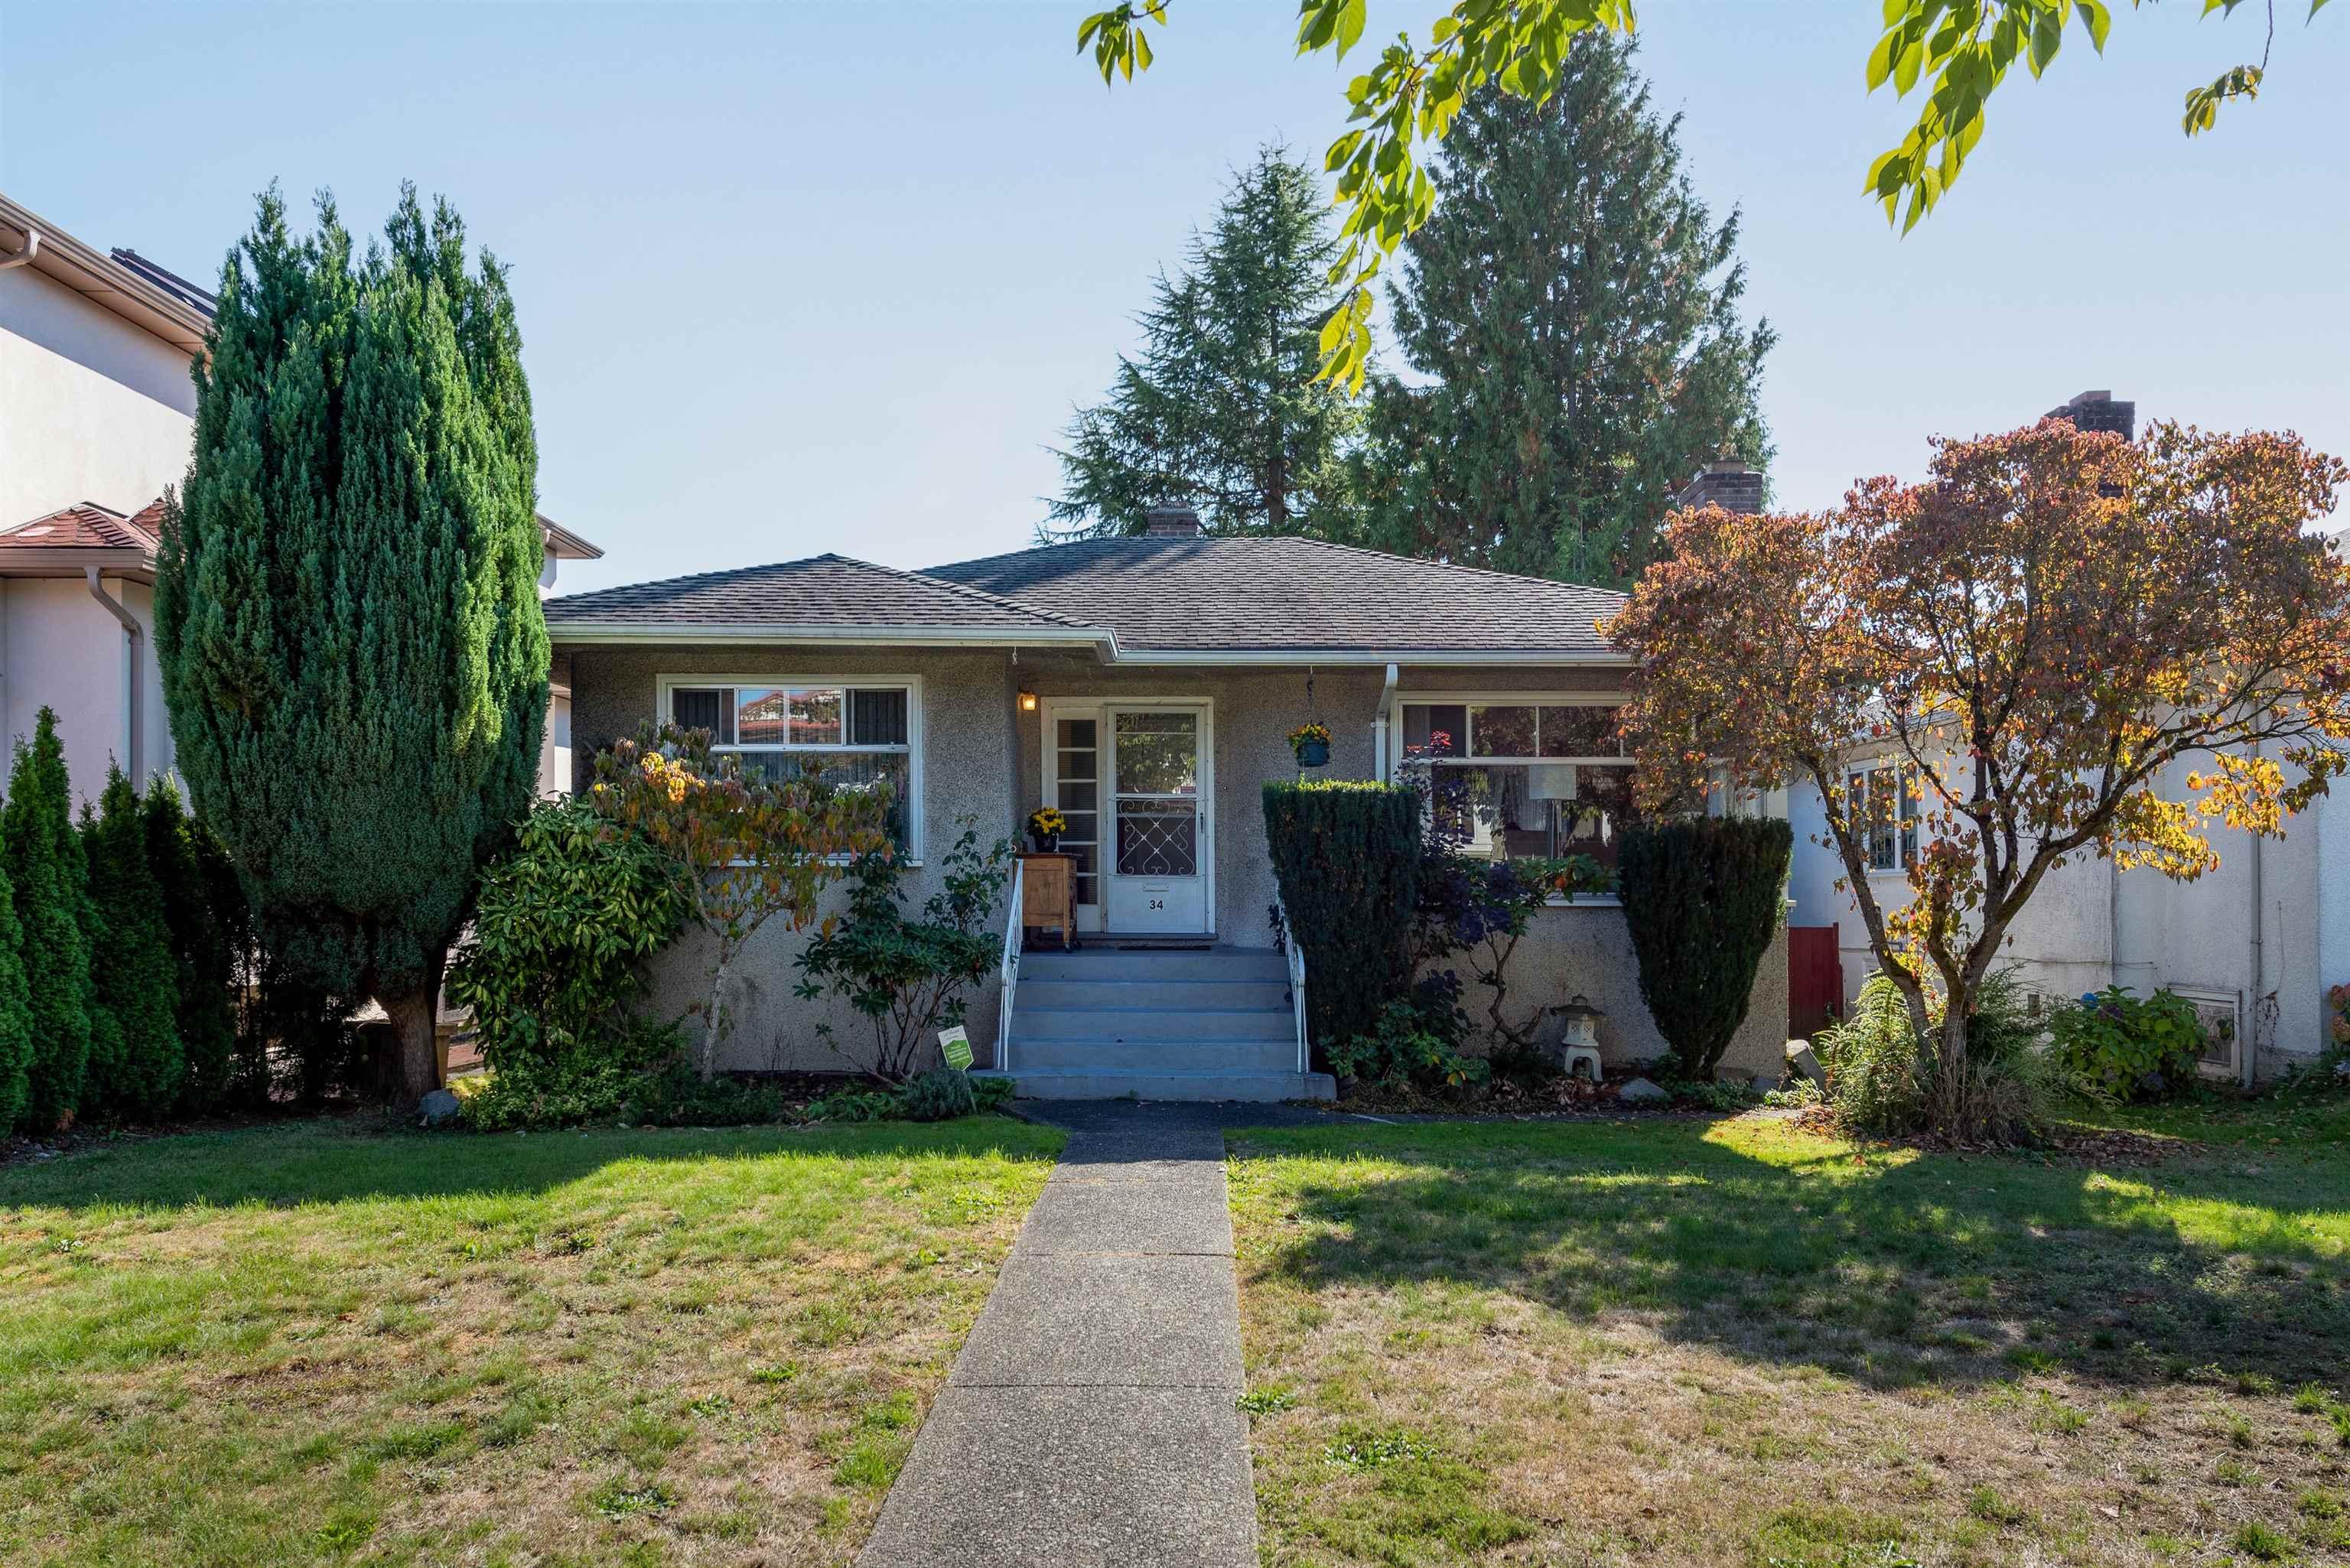 34 W 47TH AVENUE - Oakridge VW House/Single Family for sale, 4 Bedrooms (R2627161)